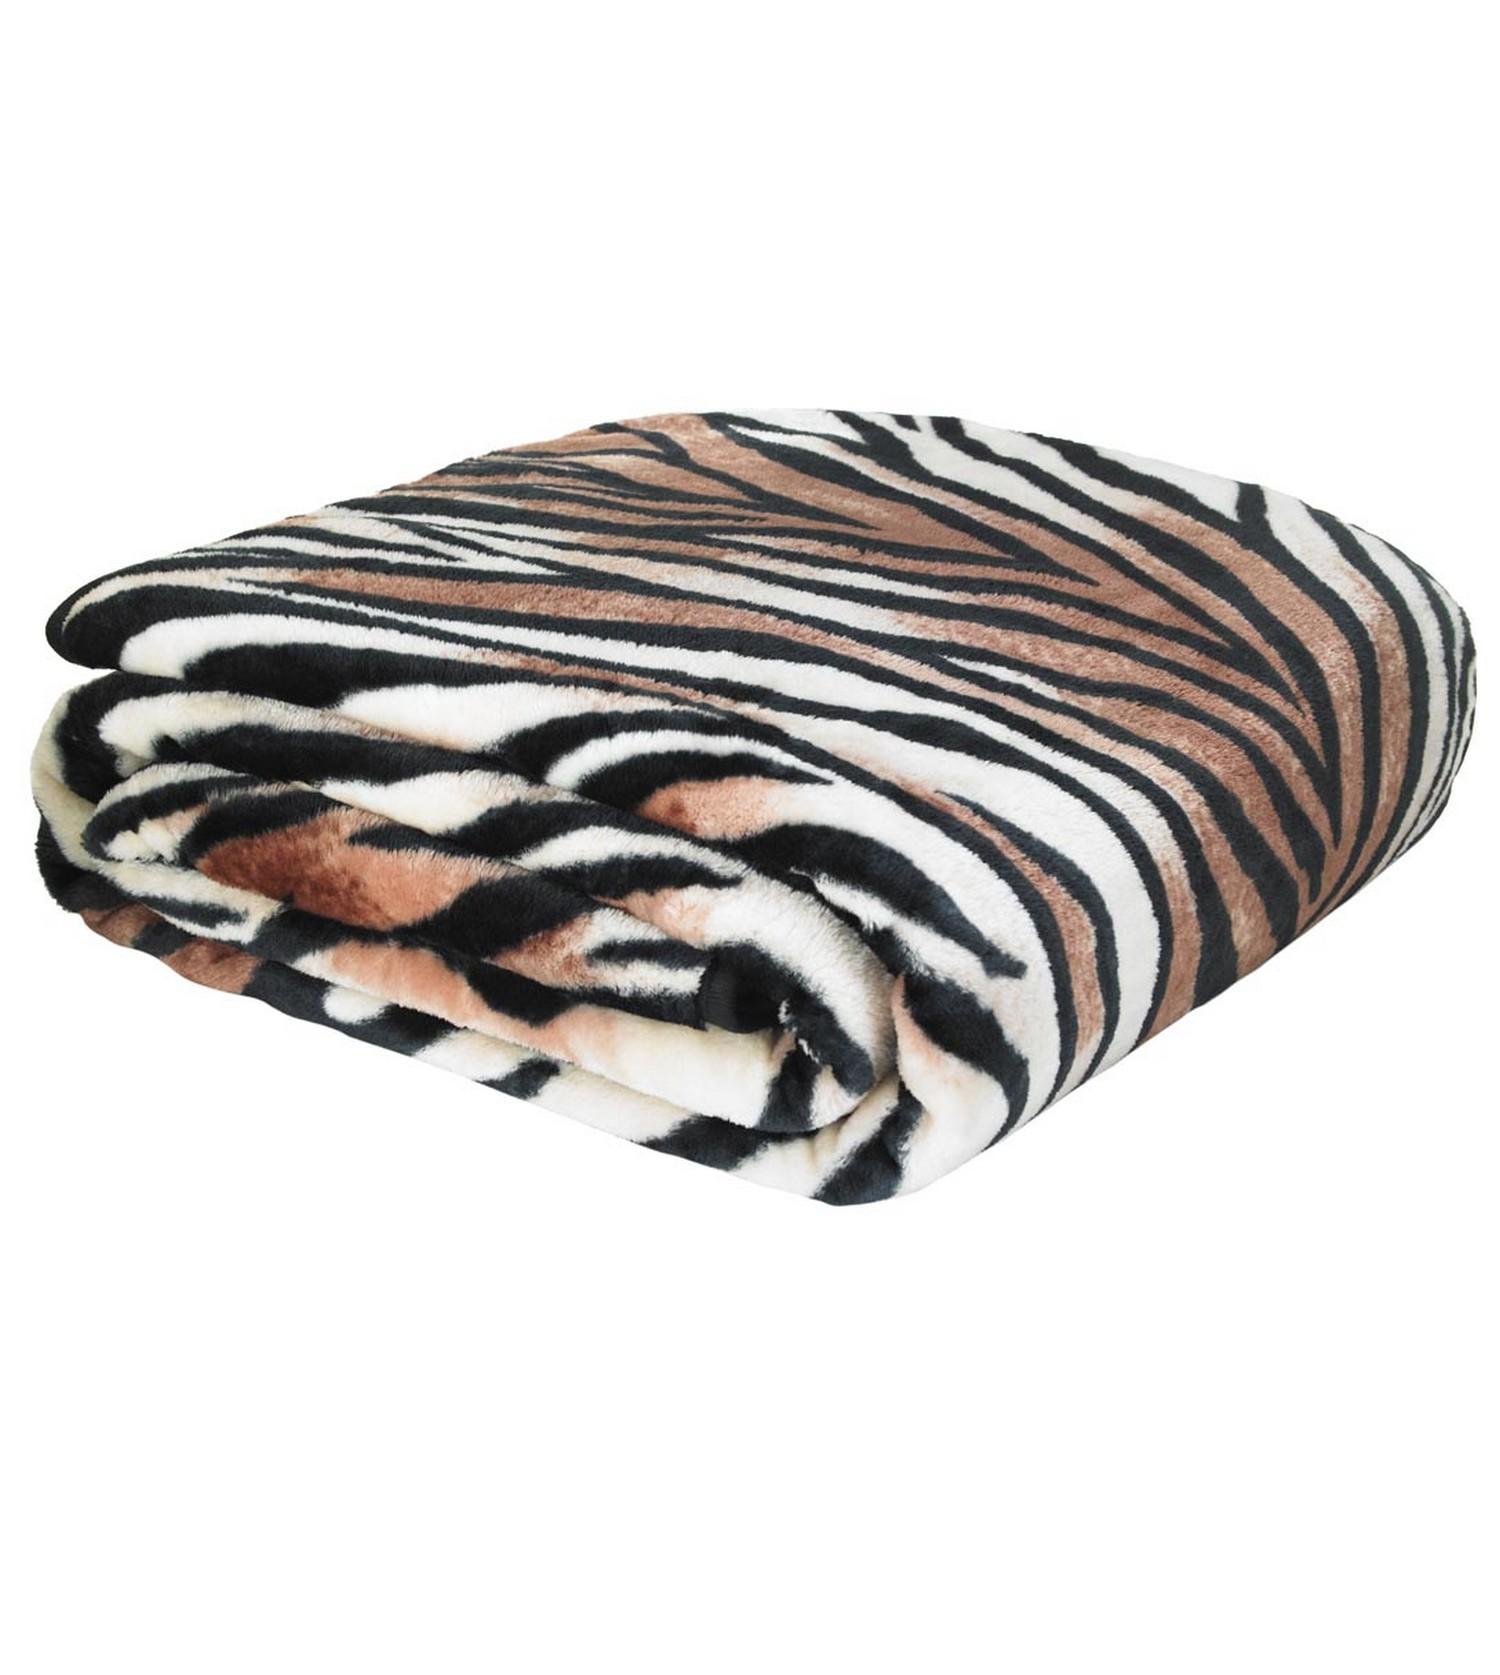 Faux Fur Animal Print Throws Blankets Raschel Warm Soft